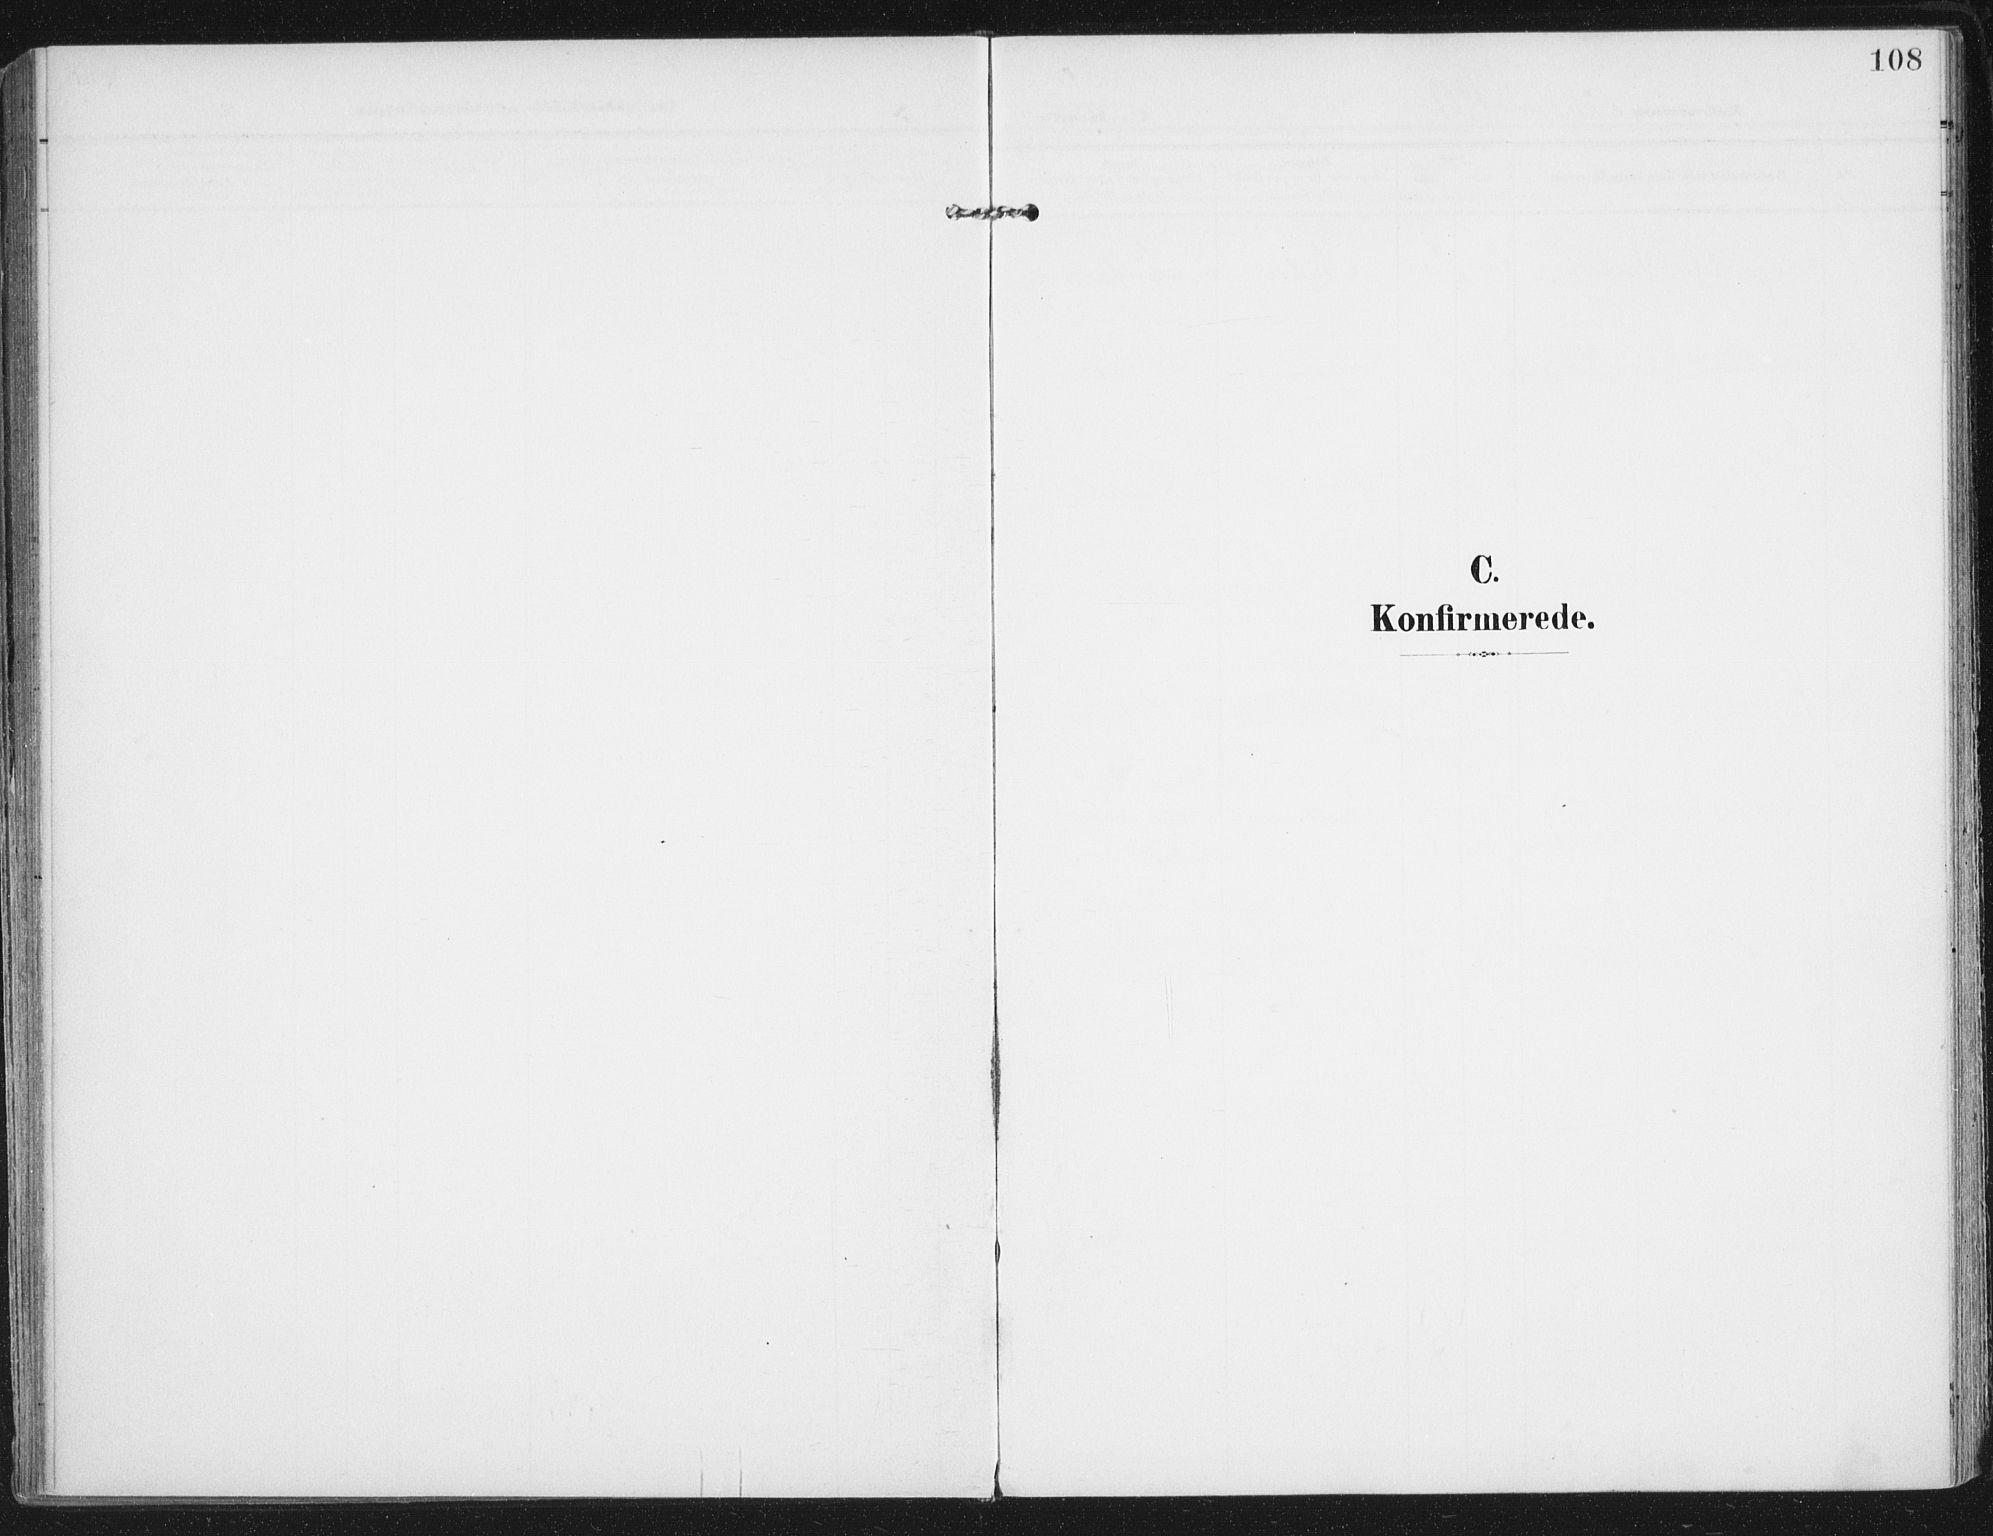 SAT, Ministerialprotokoller, klokkerbøker og fødselsregistre - Nordland, 892/L1321: Ministerialbok nr. 892A02, 1902-1918, s. 108